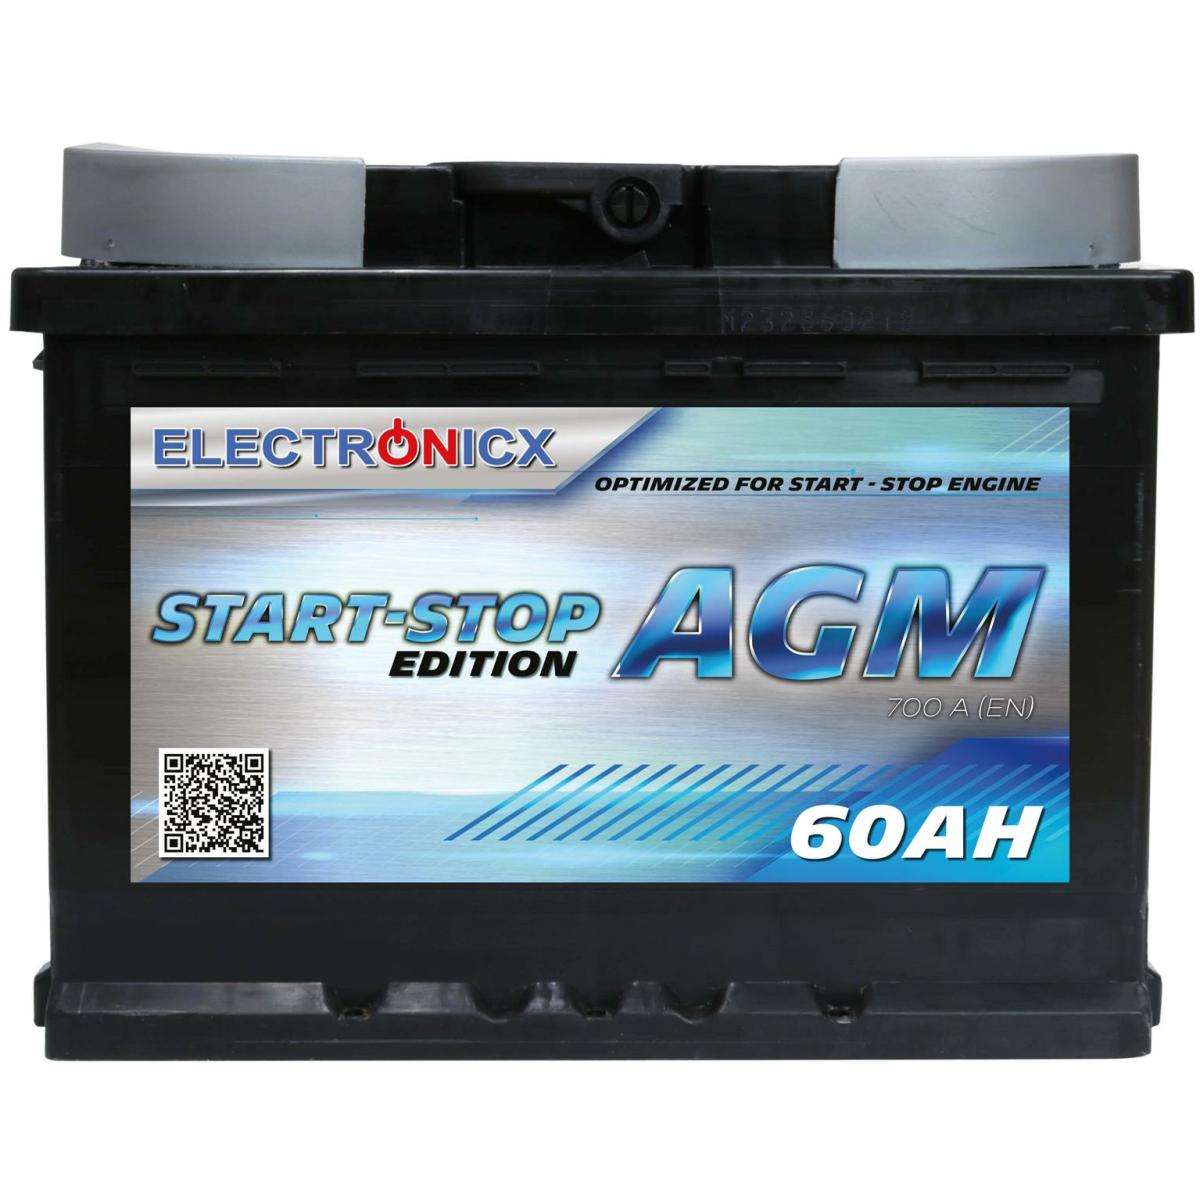 Electronicx AGM Autobatterie Starterbatterie Batterie Start-Stop 60 AH 12V 700A